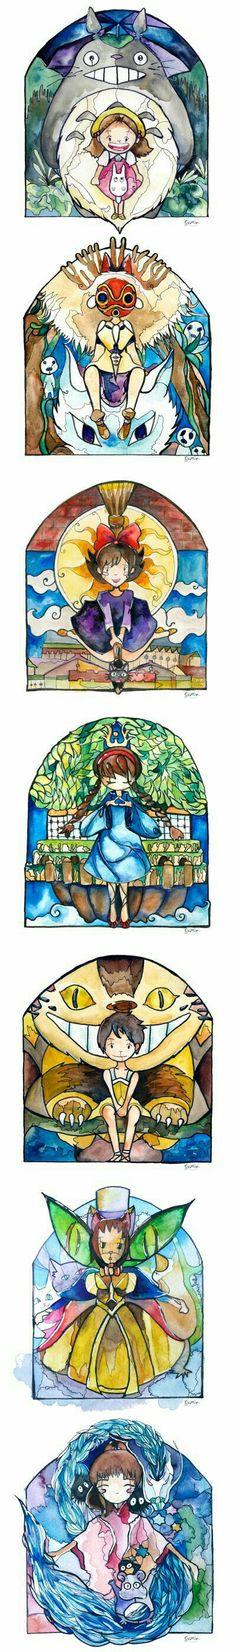 My Neighbor Totoro, Princess Mononoke, Kiki's Delivery Service, Castle in the Sky, The Cat Returns, Spirited Away, glass, art, windows; Studio Ghibli